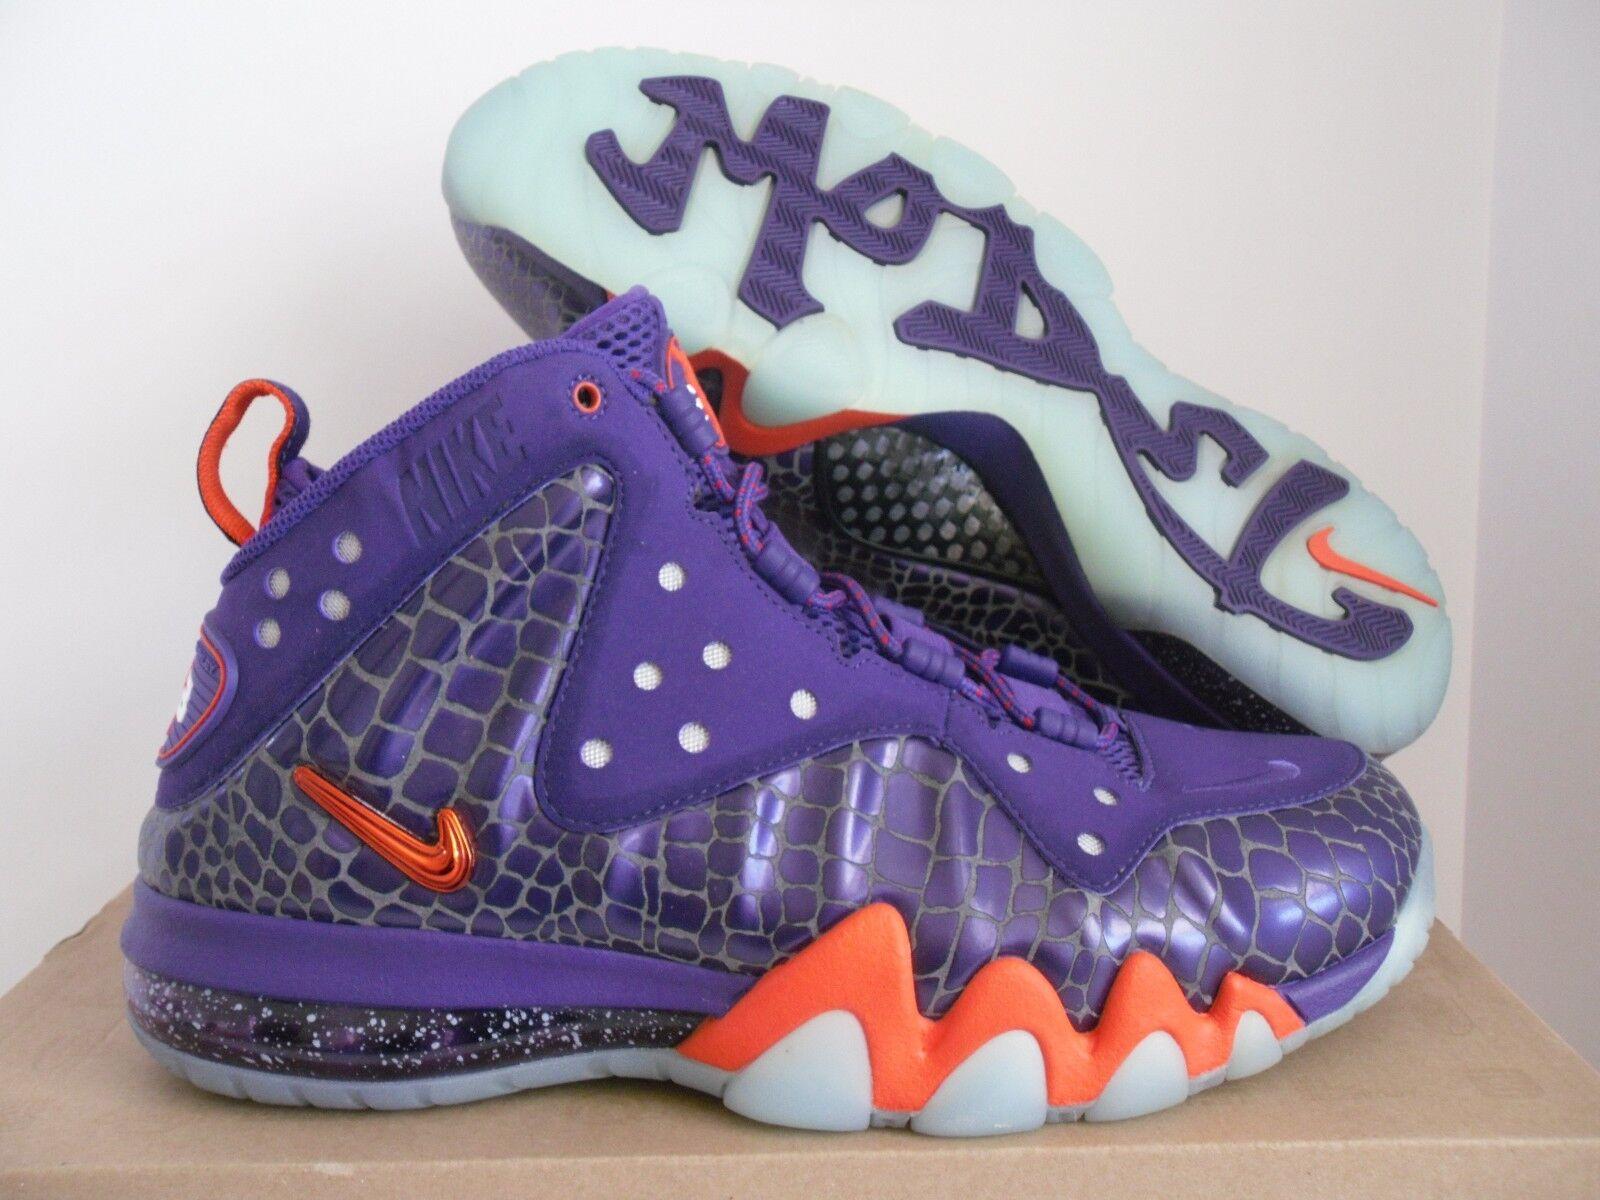 nike barkley posite sz max gericht purple-team orange sz posite 7.5 [555097-581] efd8f5